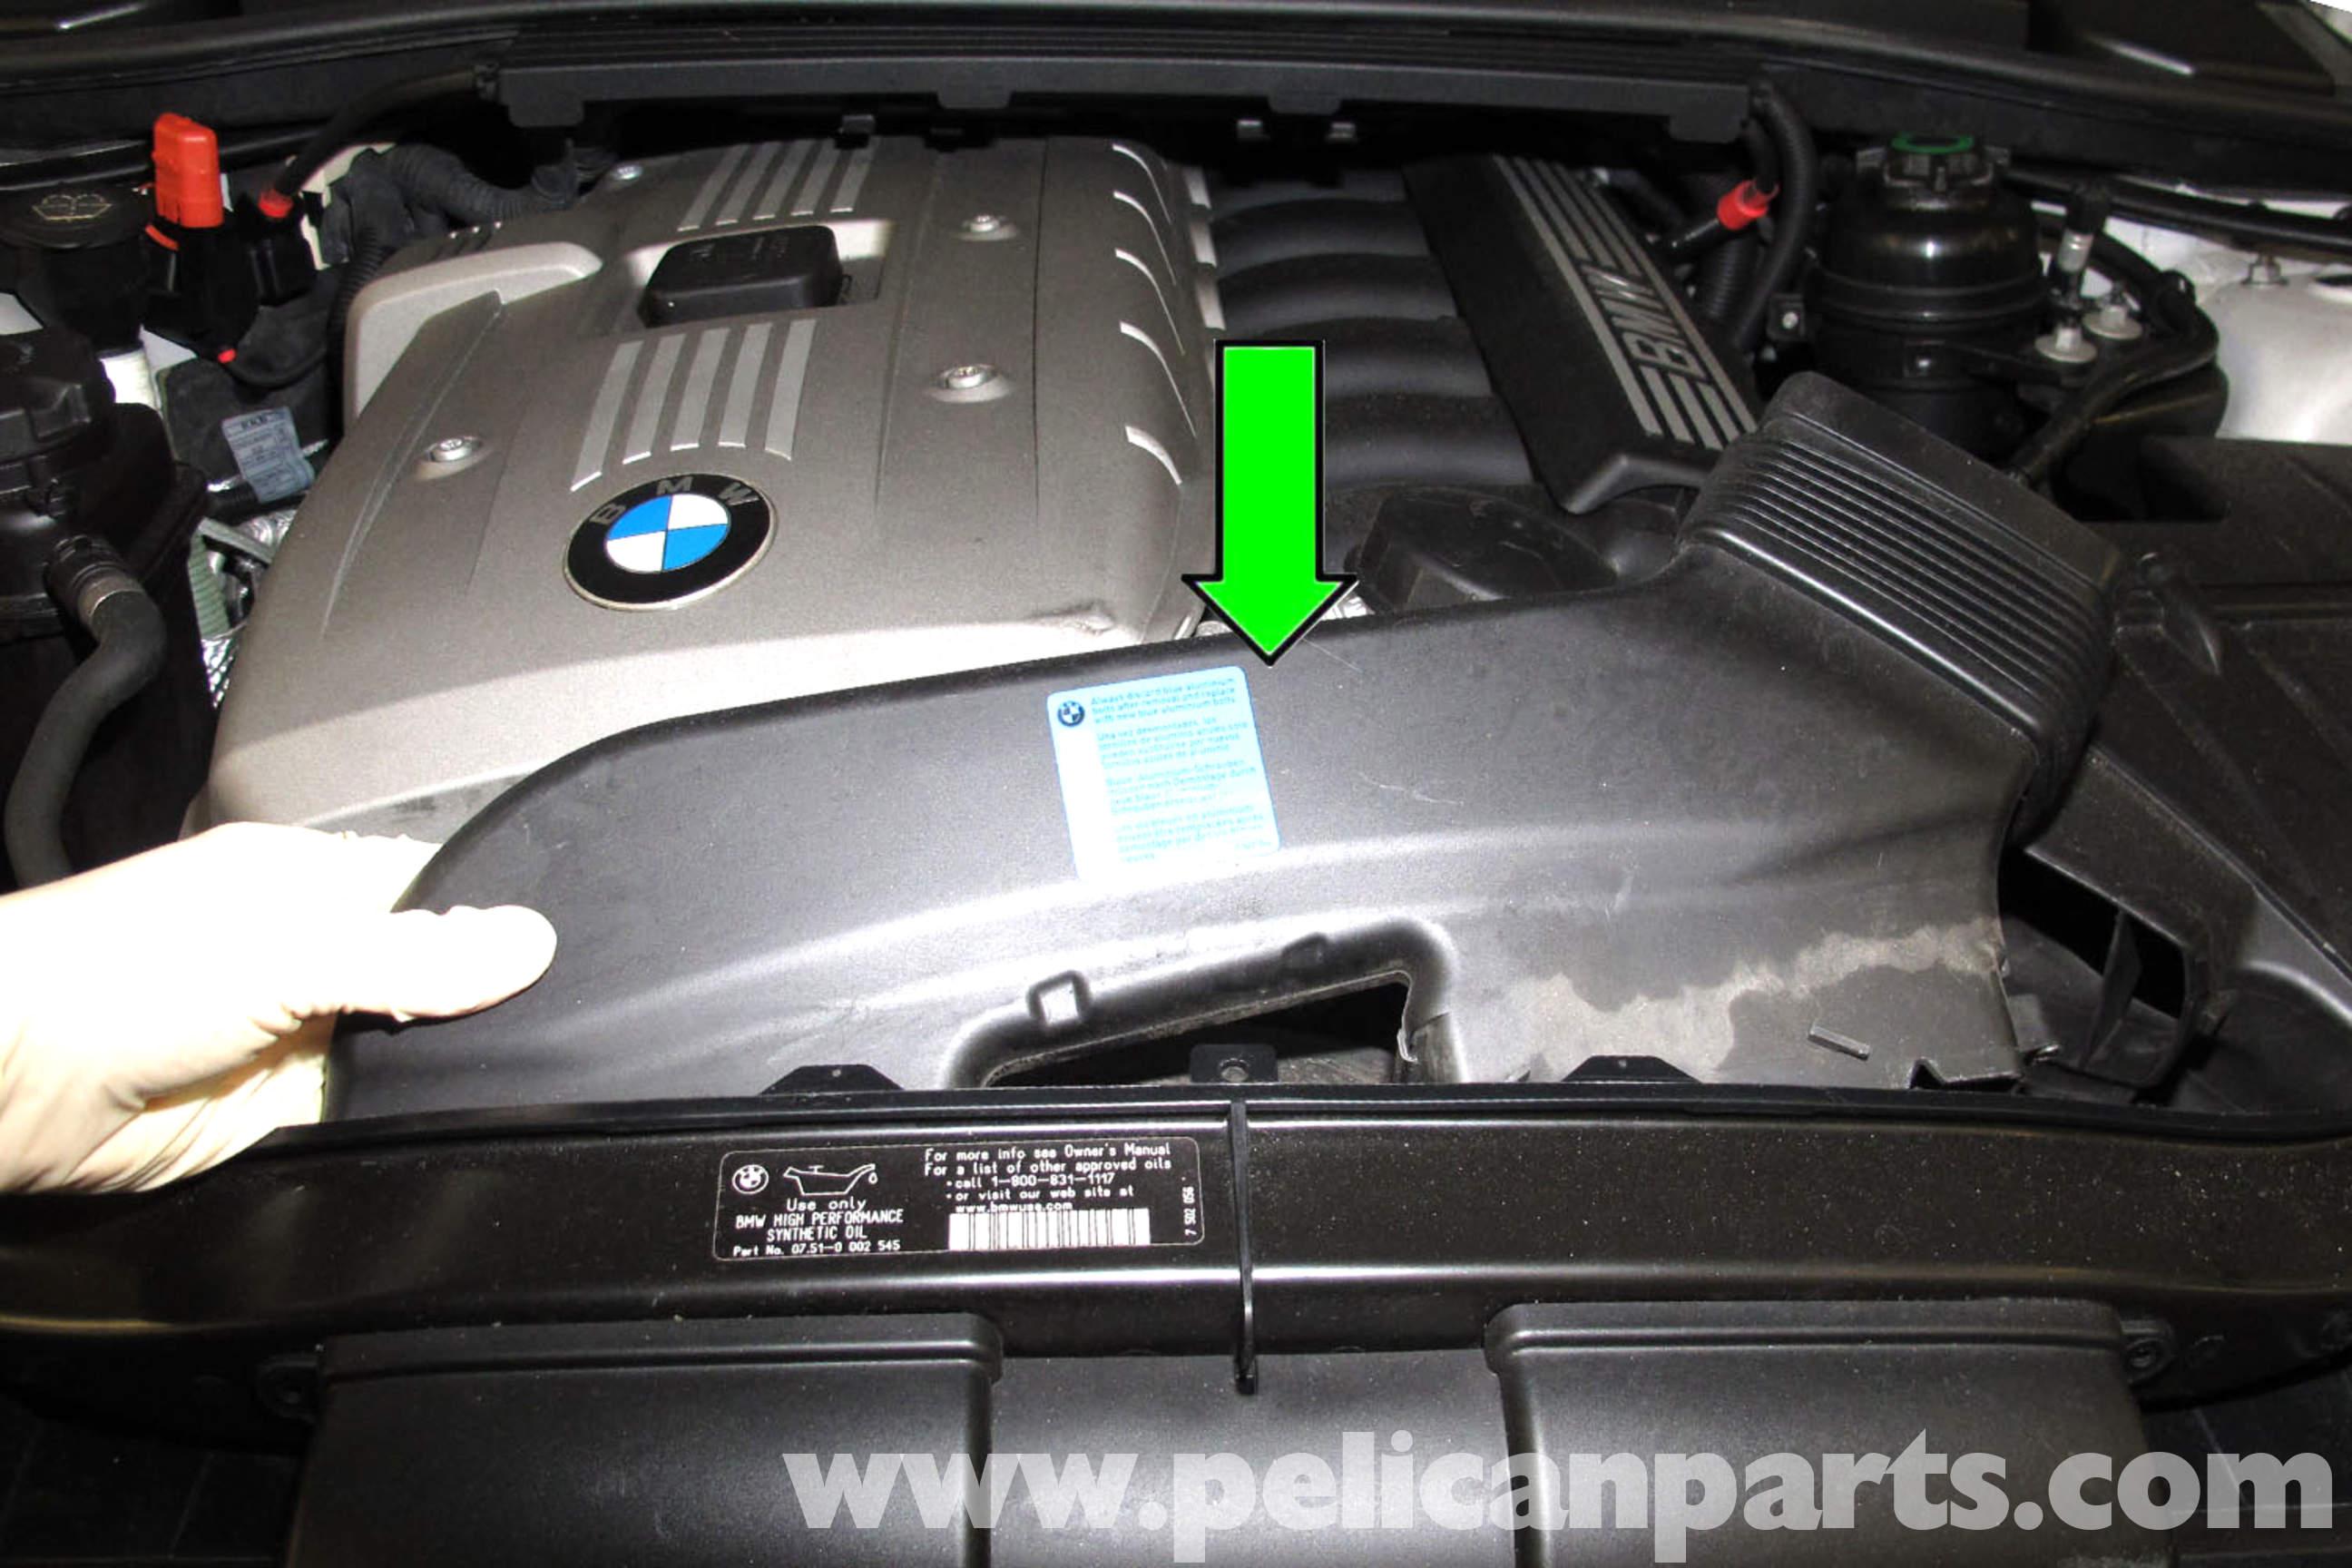 2006 bmw 325i engine diagram dual wiring e90 vanos solenoid replacement | e91, e92, e93 pelican parts diy maintenance article